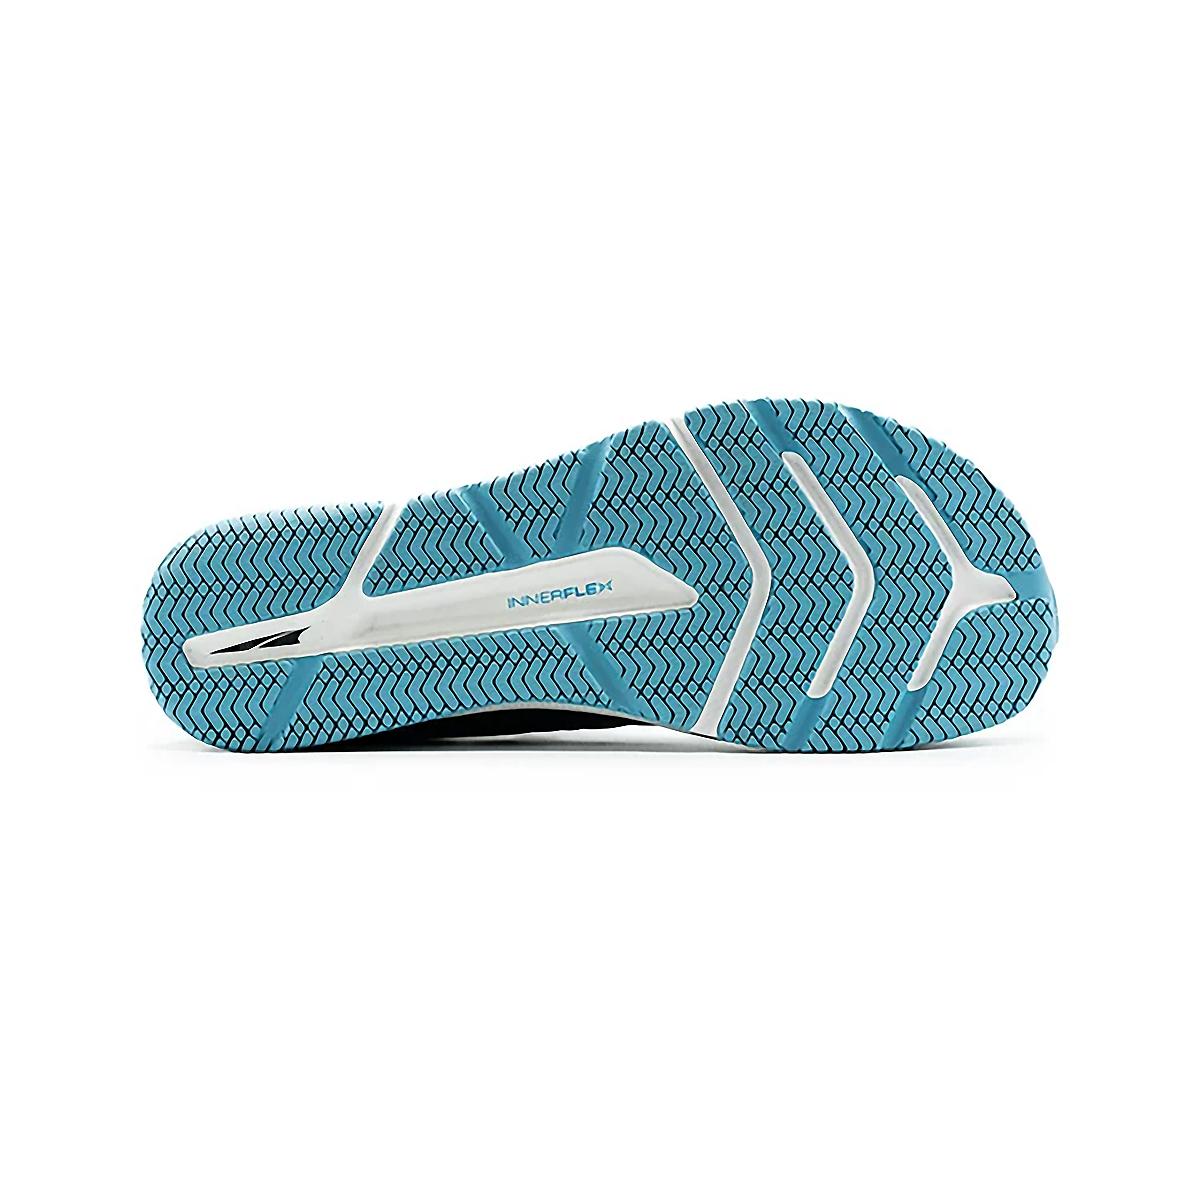 Men's Altra Solstice XT Training Shoes - Color: Navy/Light Blue - Size: 9.5 - Width: Regular, Navy/Light Blue, large, image 4